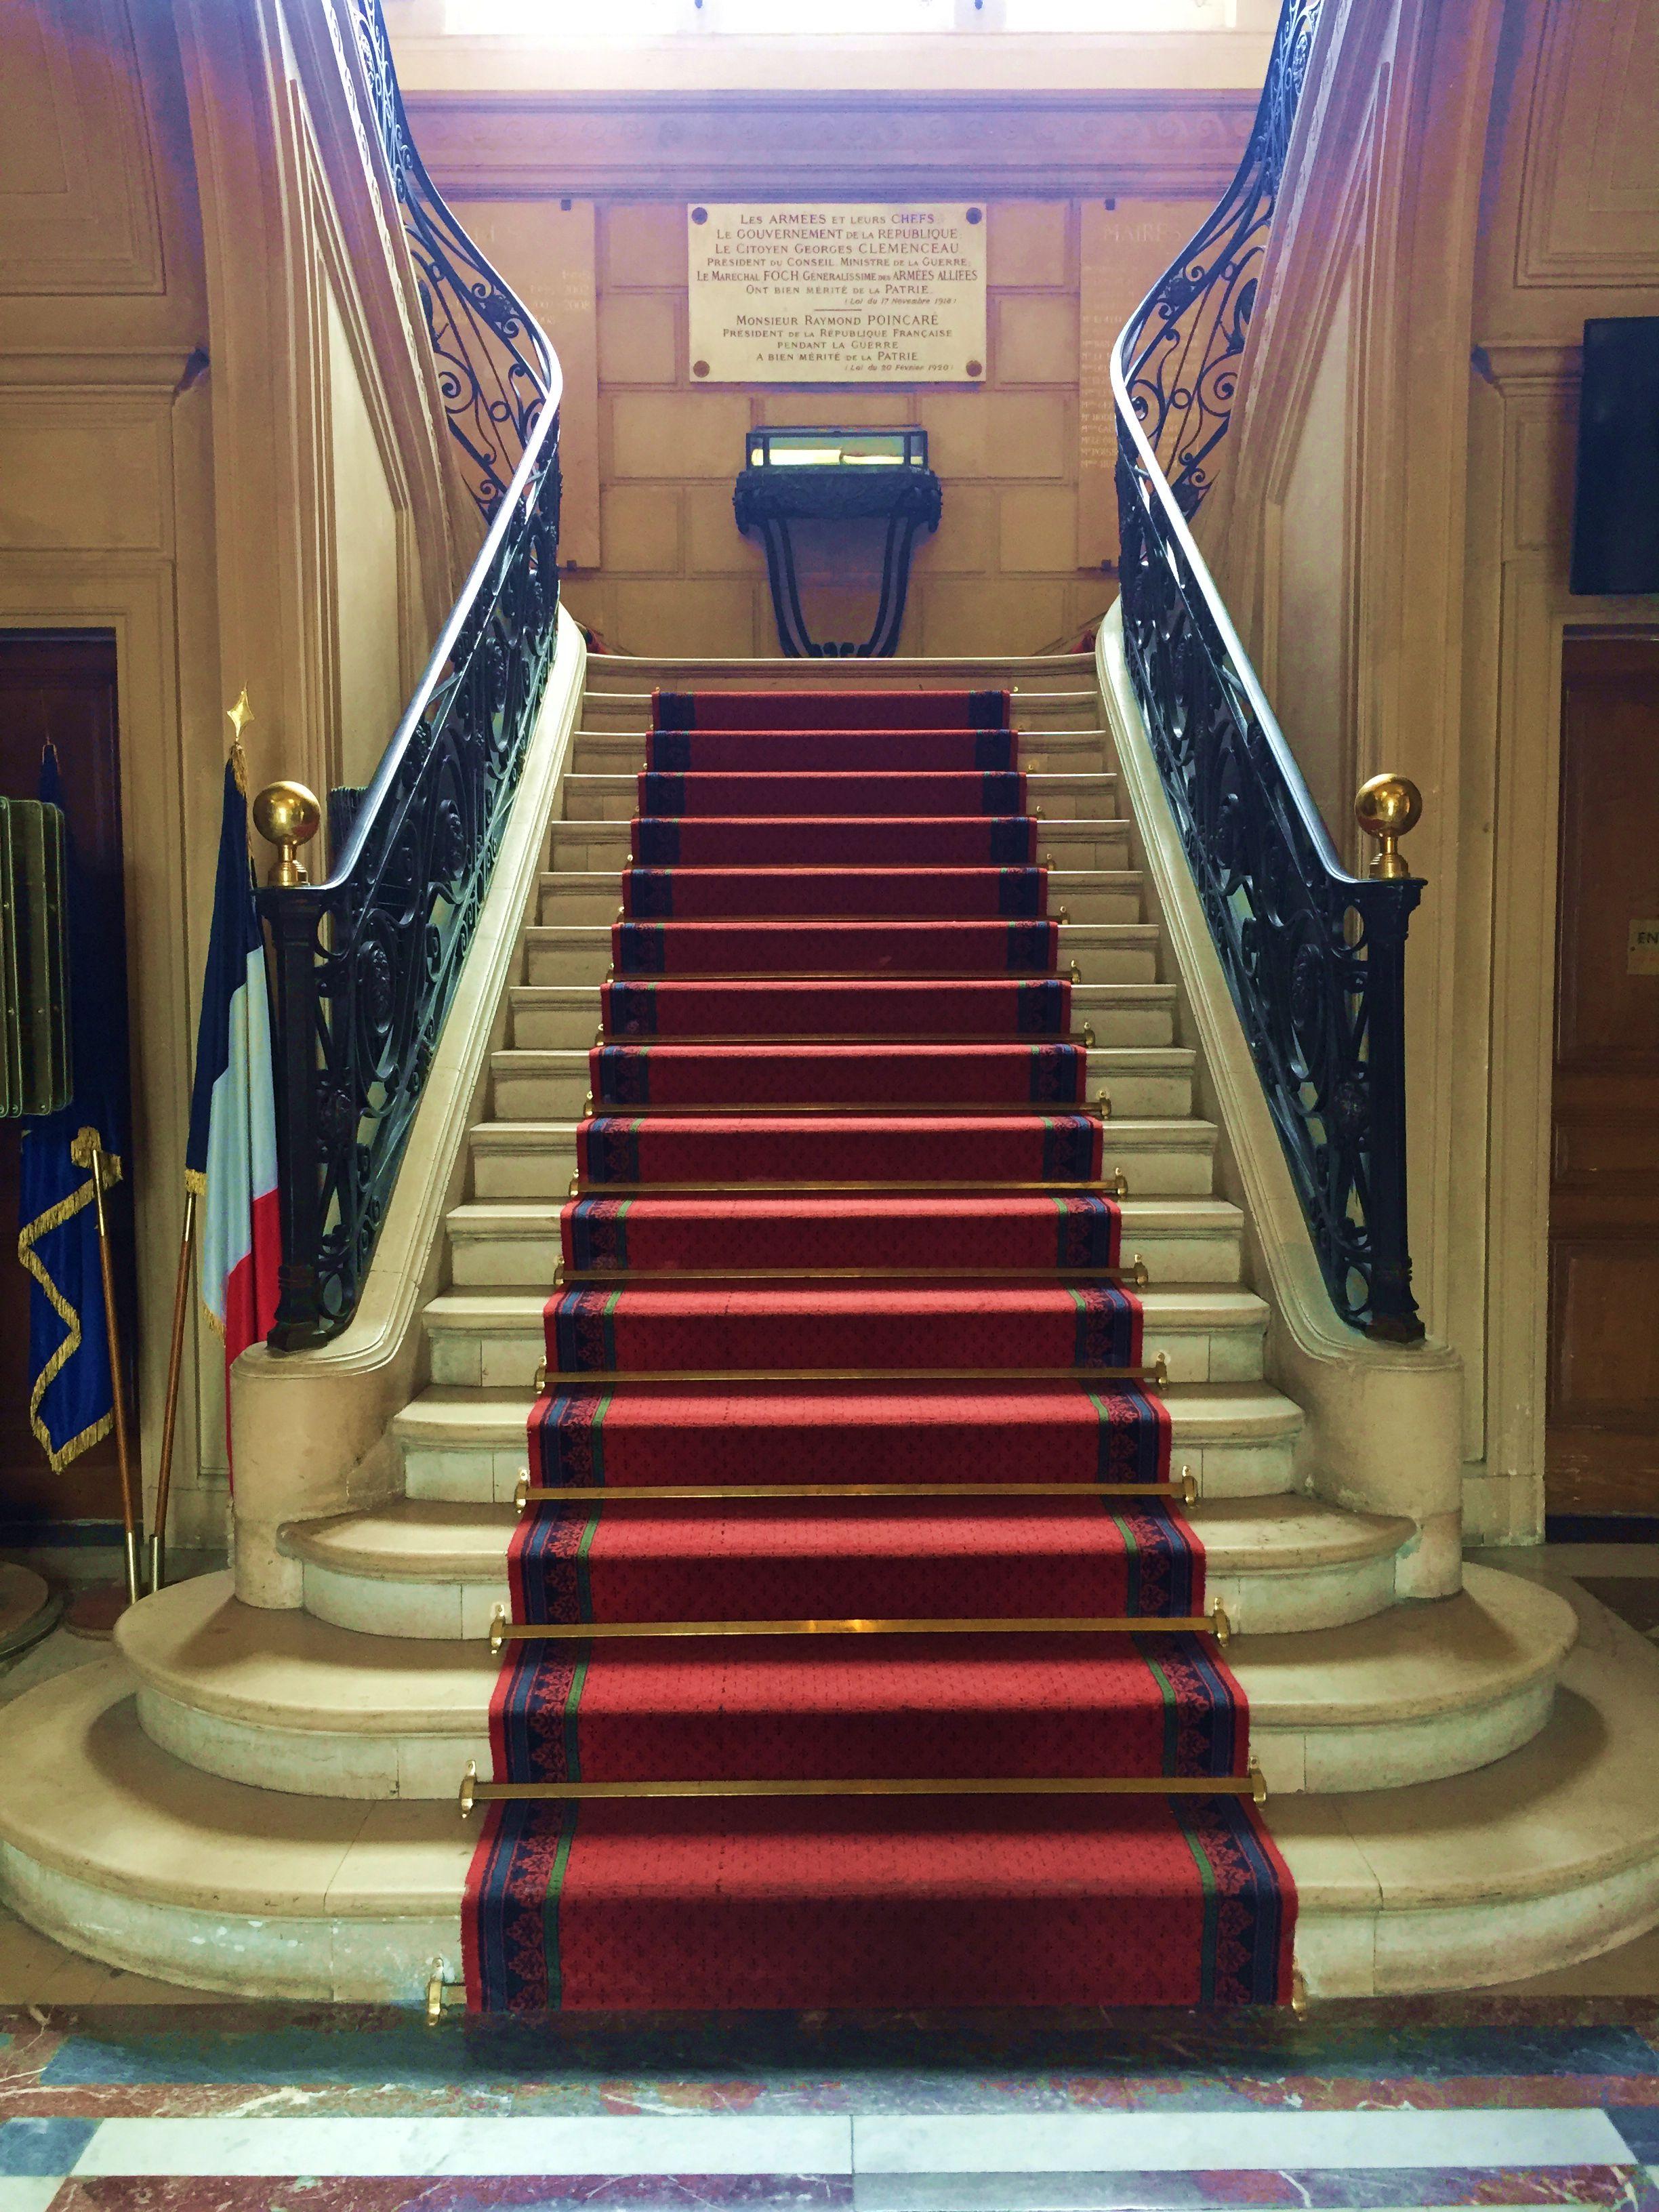 Soir e d 39 t de la chambre l 39 h tel de villars chambre - Chambre de commerce franco canadienne ...